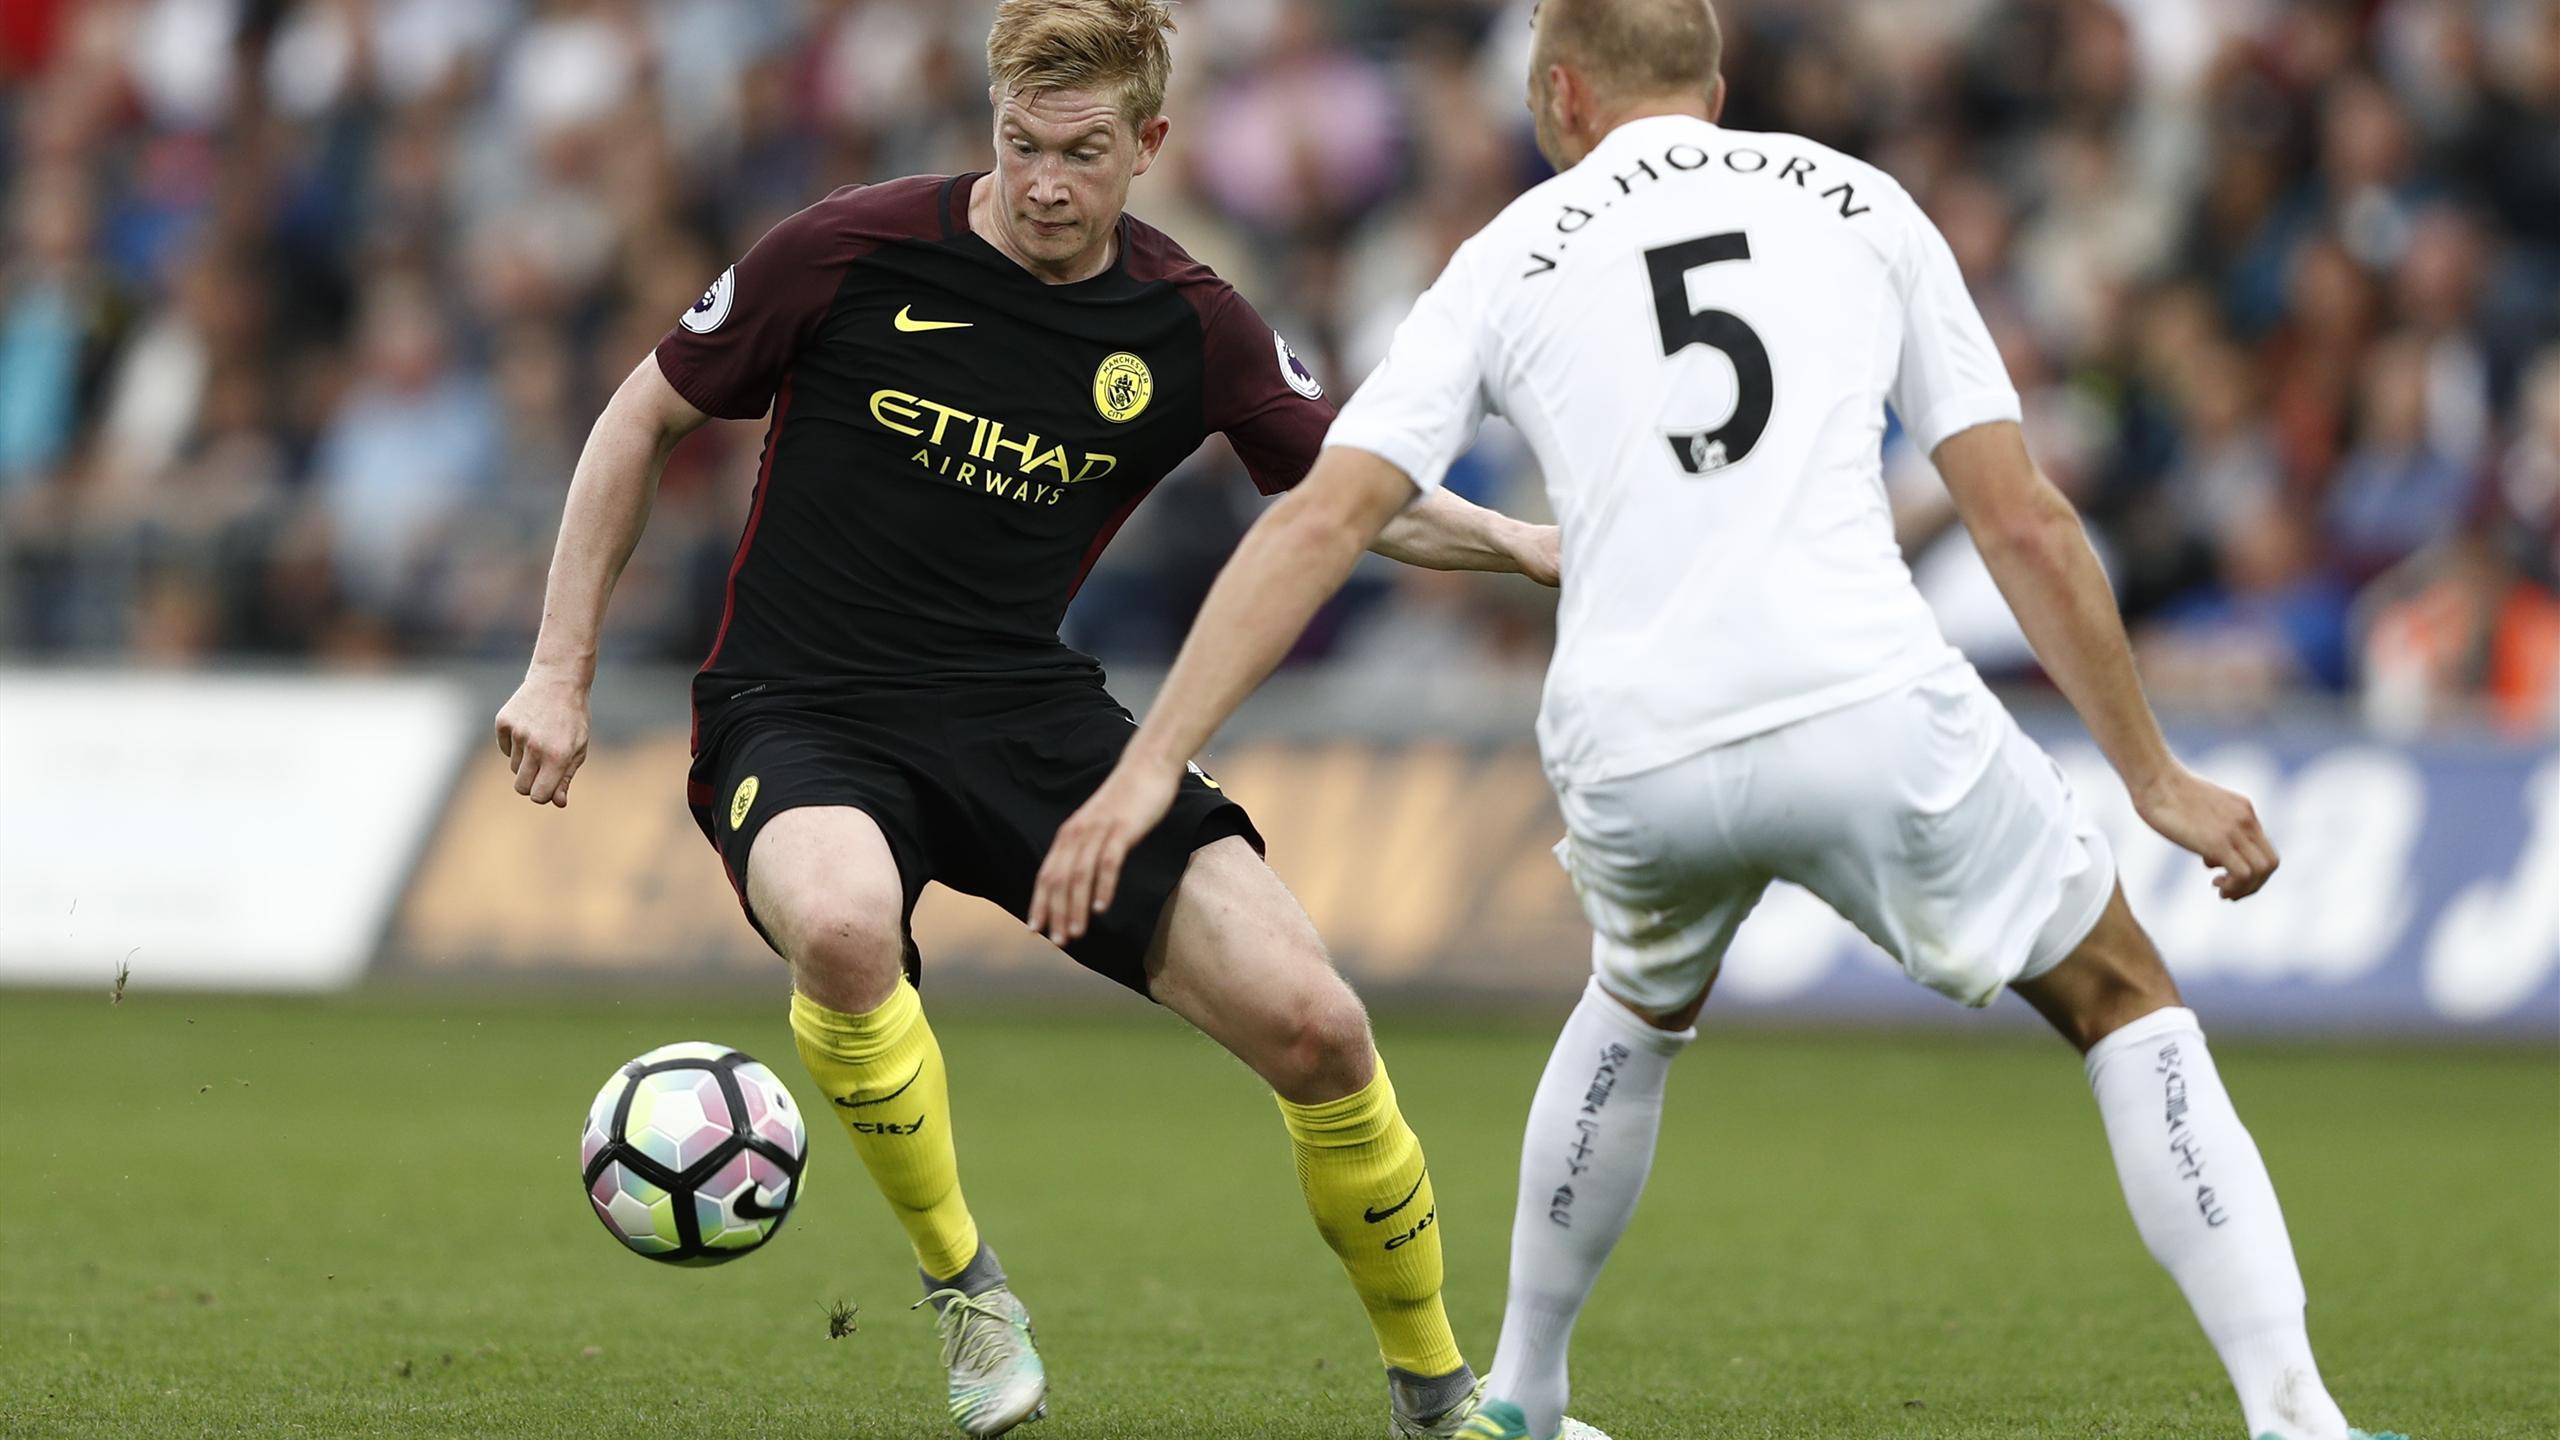 Manchester City's Belgian midfielder Kevin De Bruyne (L) takes on Swansea City's Dutch defender Mike van der Hoorn